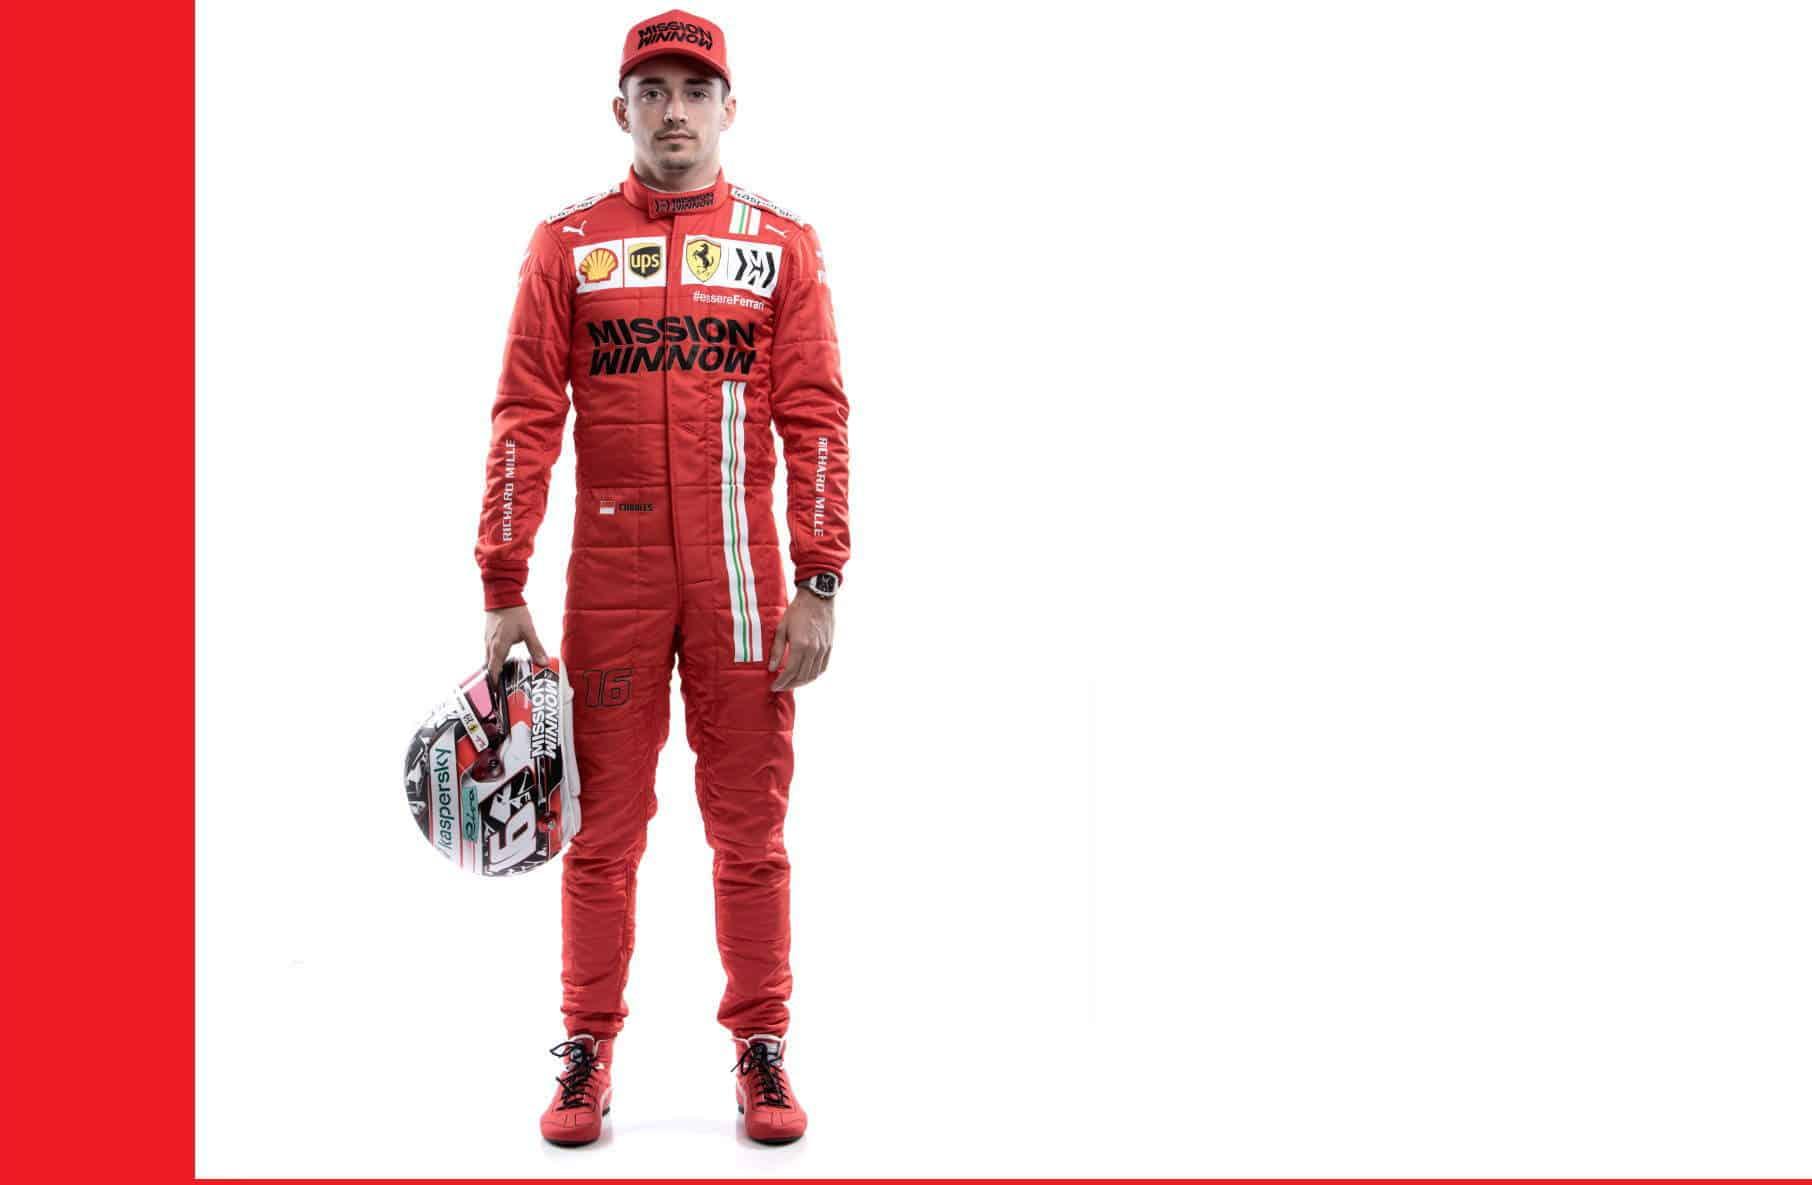 Charles Leclerc Ferrari F1 2021 new Photo Ferrari Edited by MAXF1net